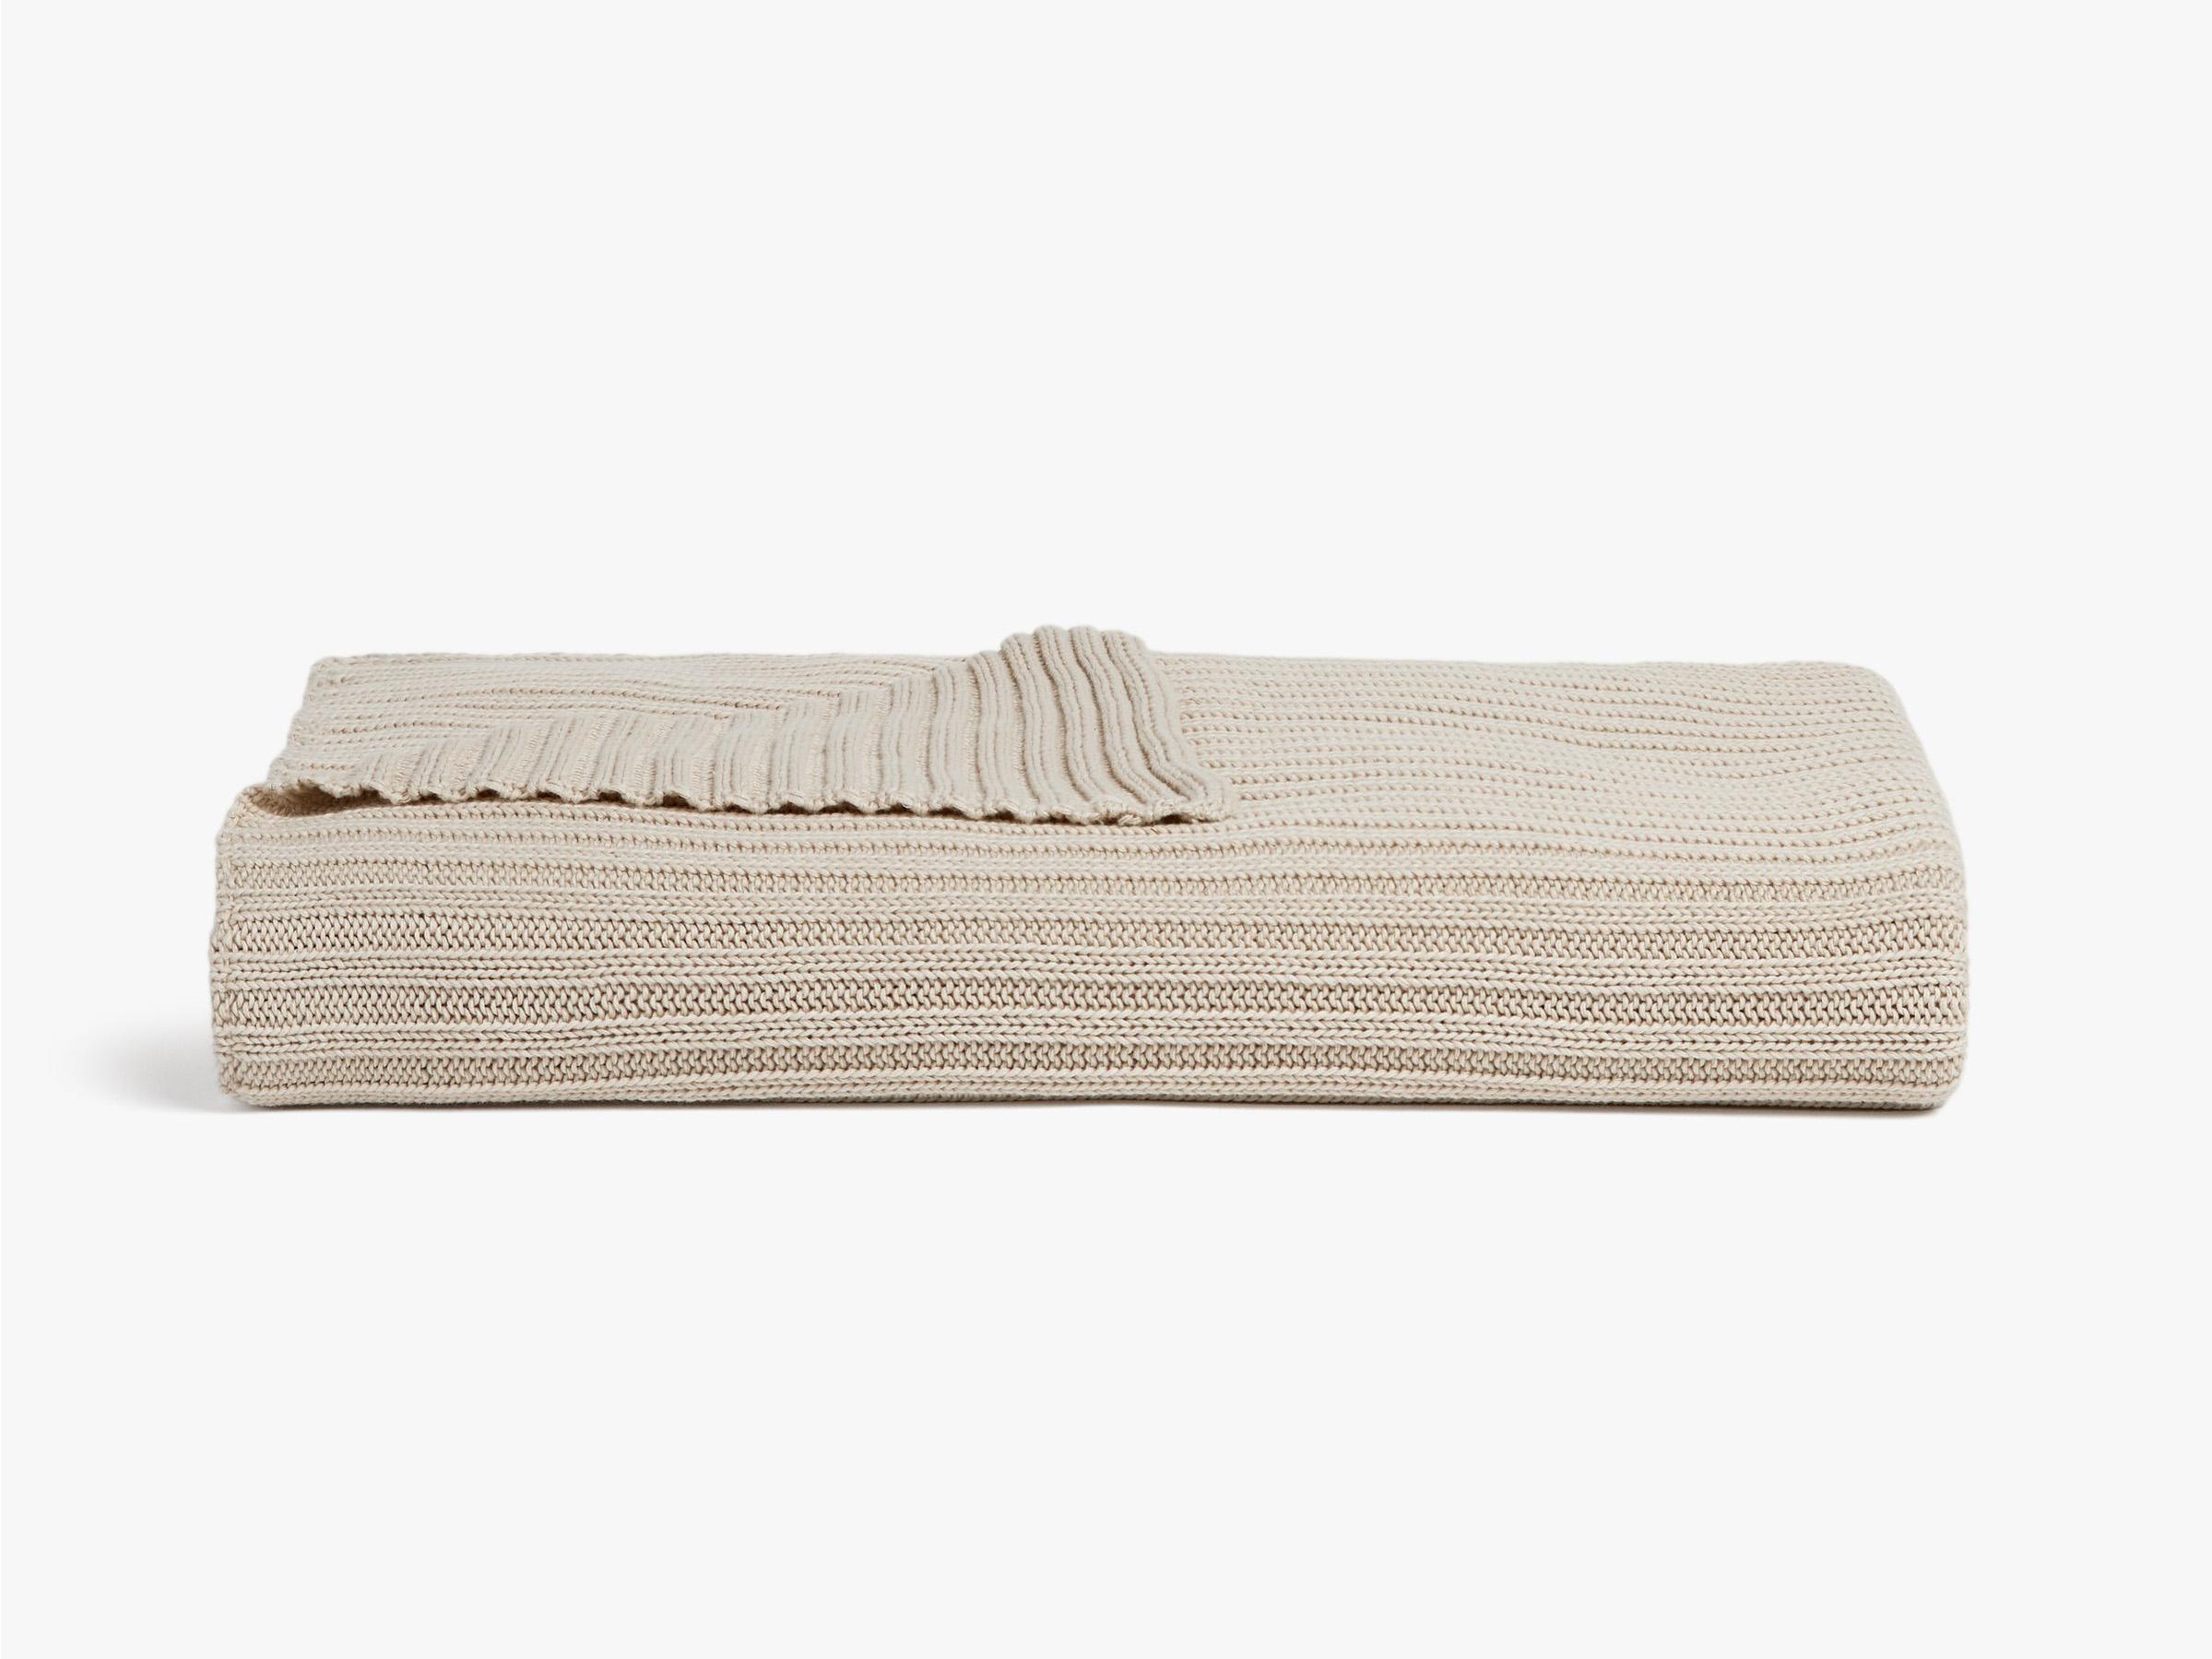 Best Throw Blankets - Parachute Knit Throw